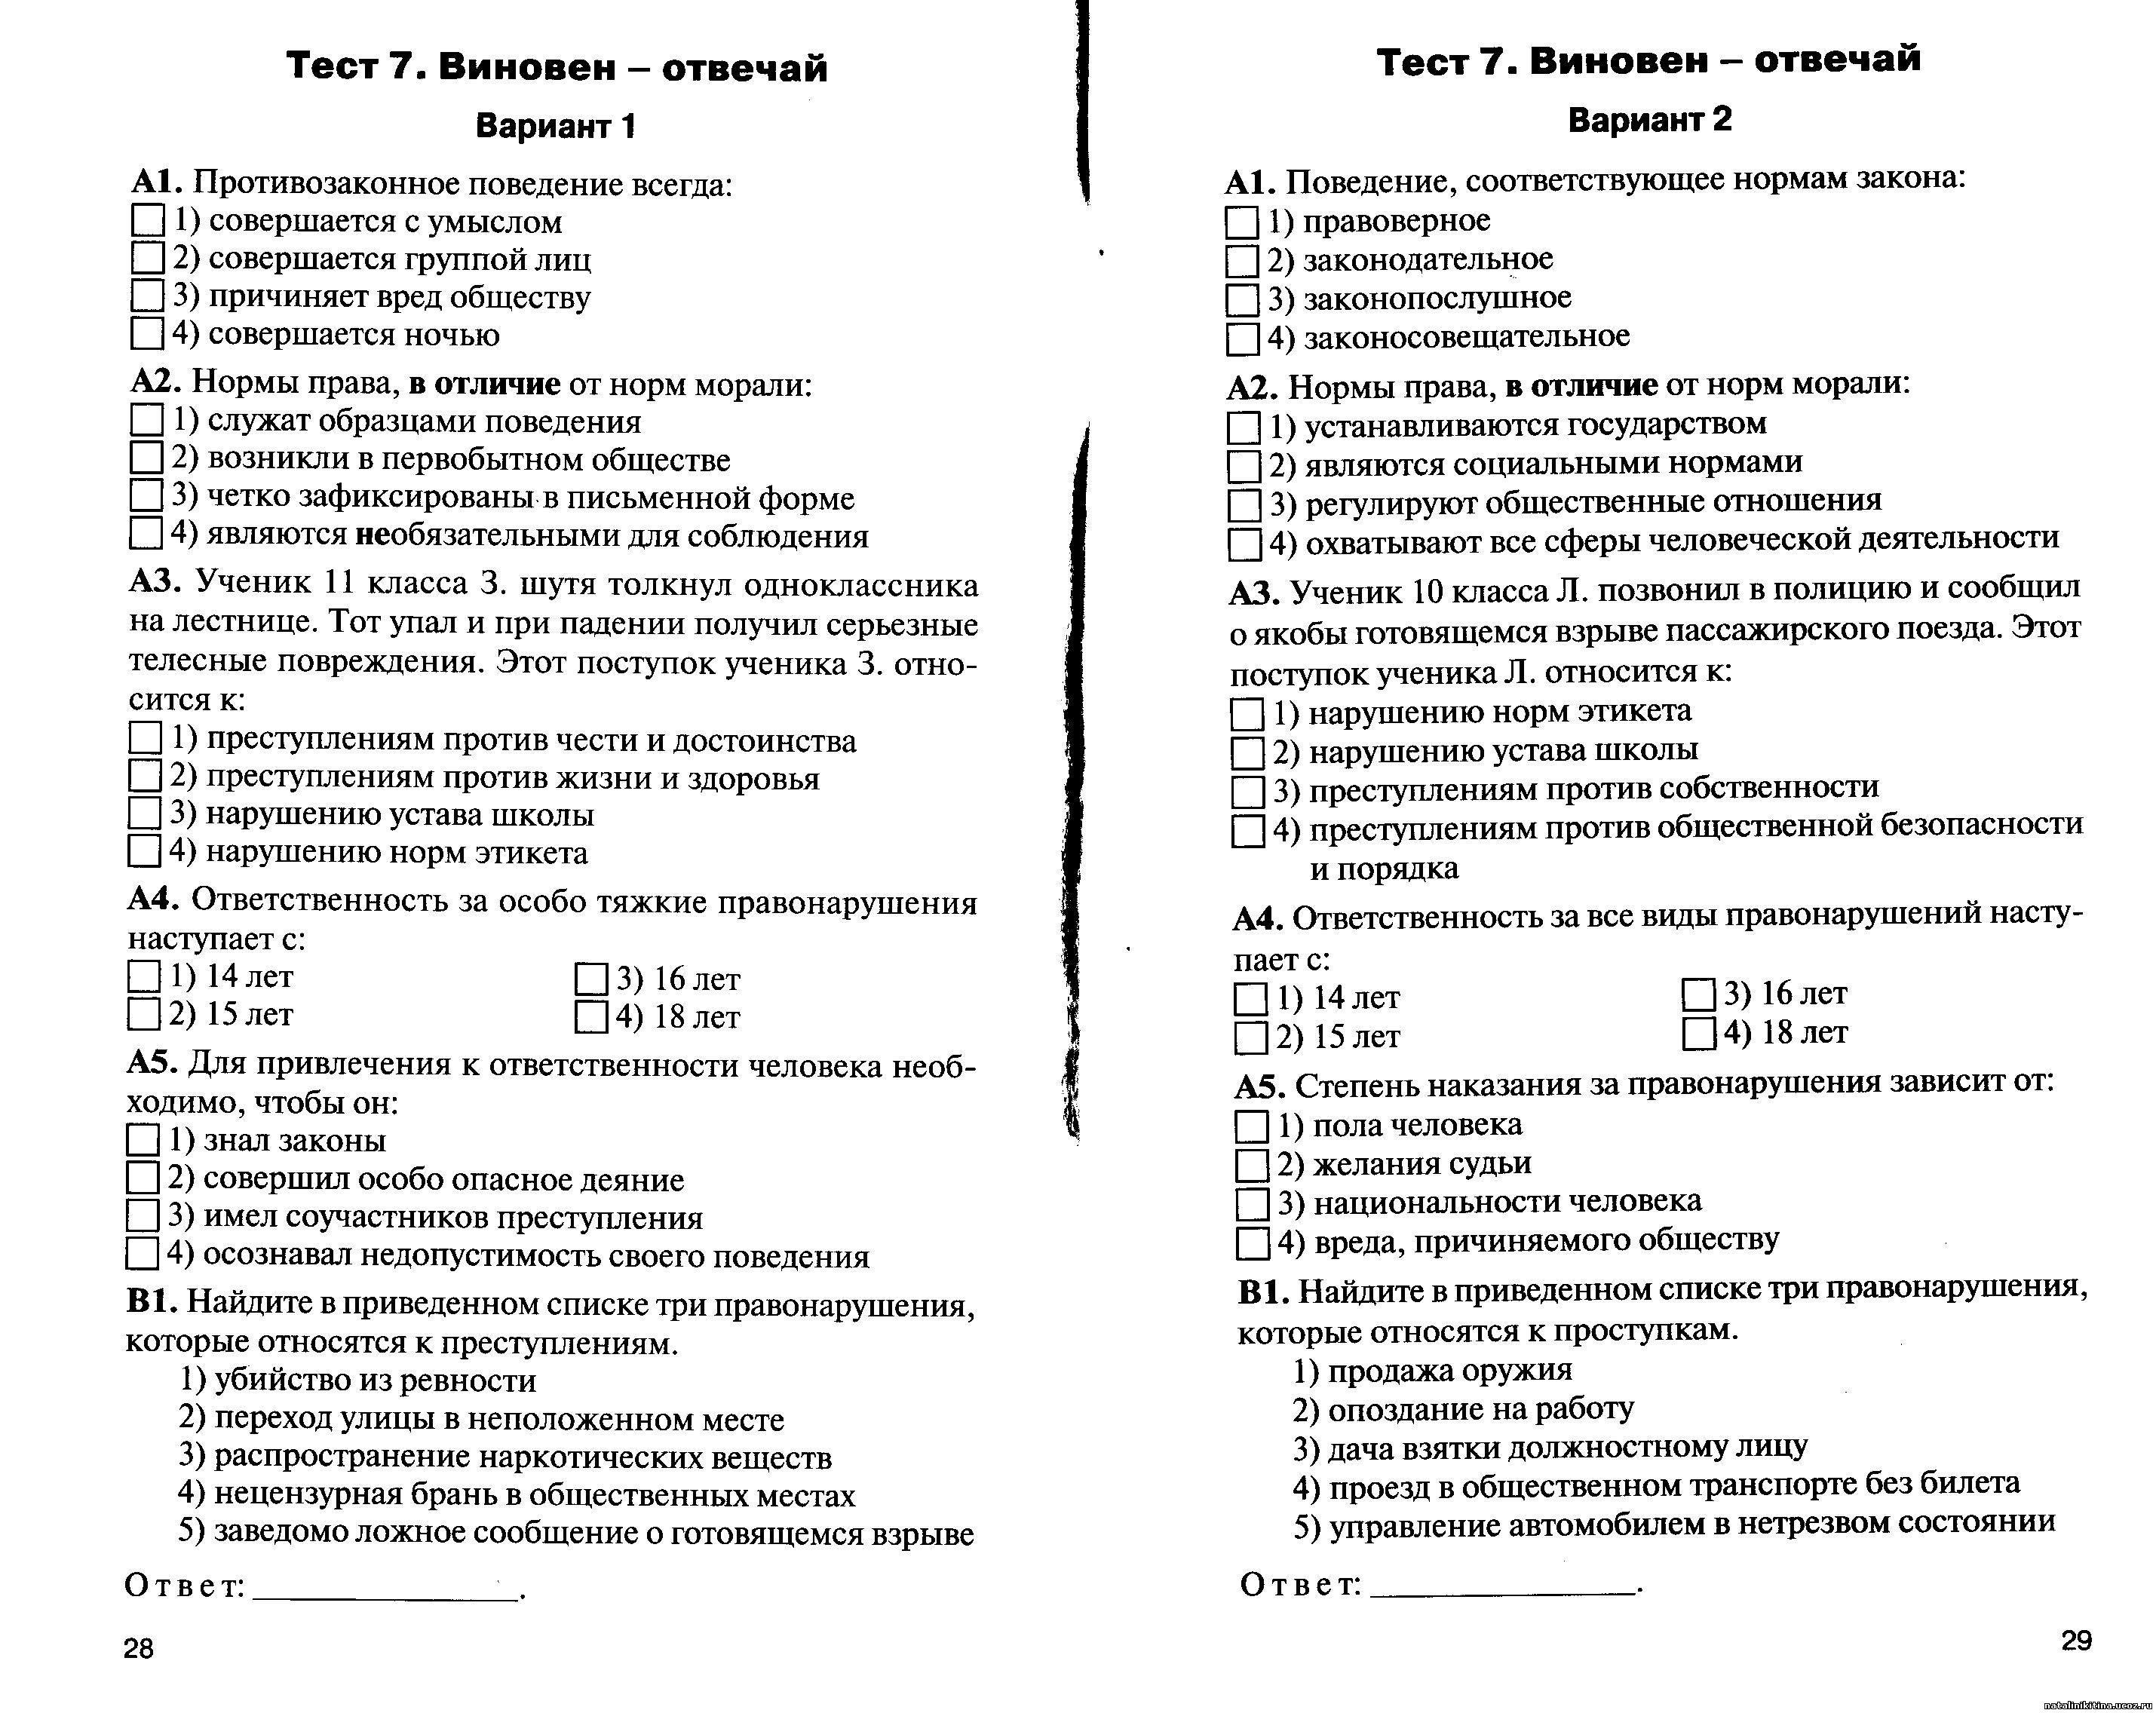 Виновен отвечай тест по обществознанию 7 класс